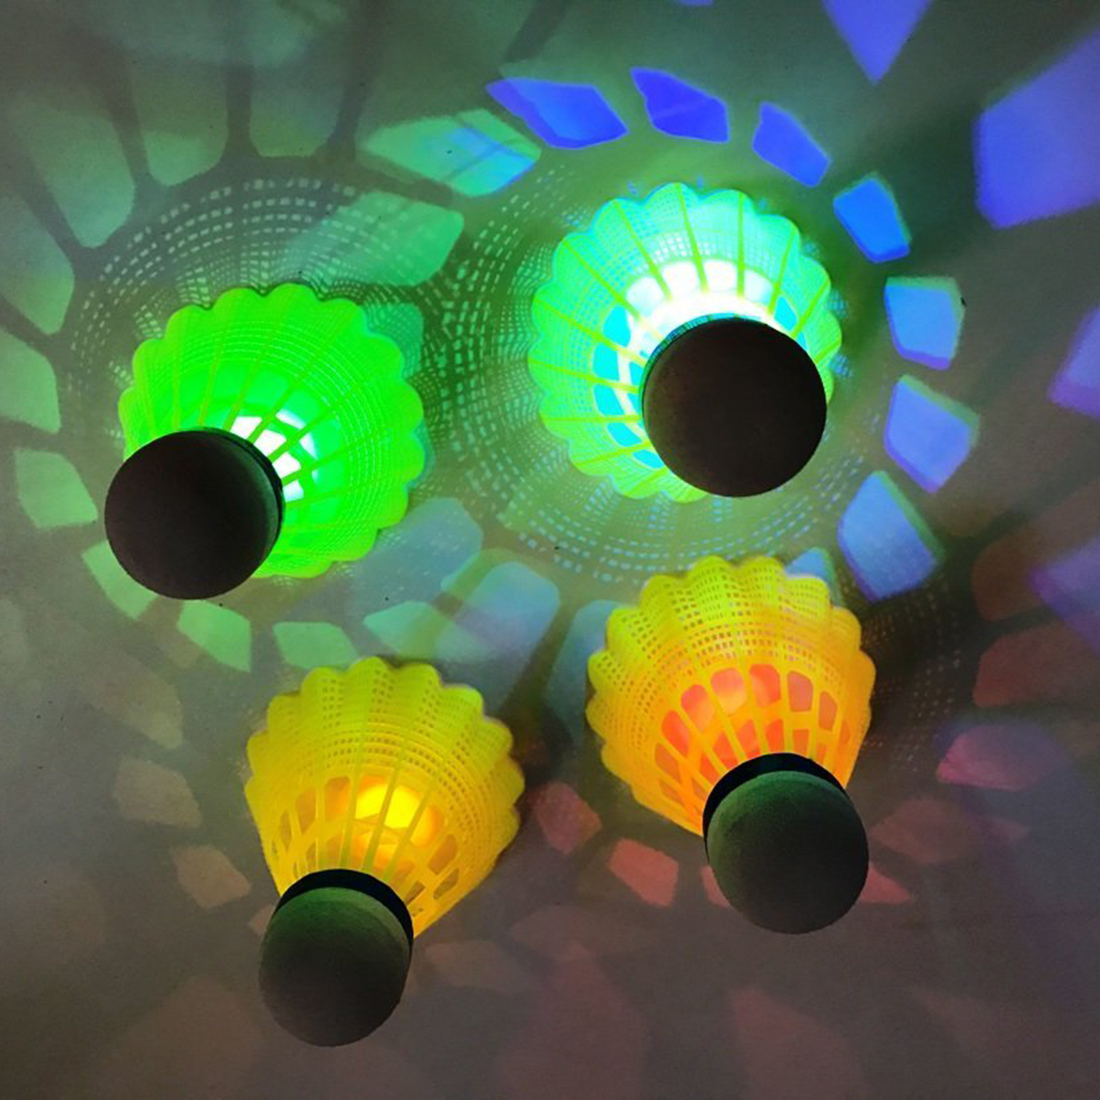 4Pcs Pack LED Luminous Badminton Newfangled Dark Night Glow Lighting Shuttlecock Ra